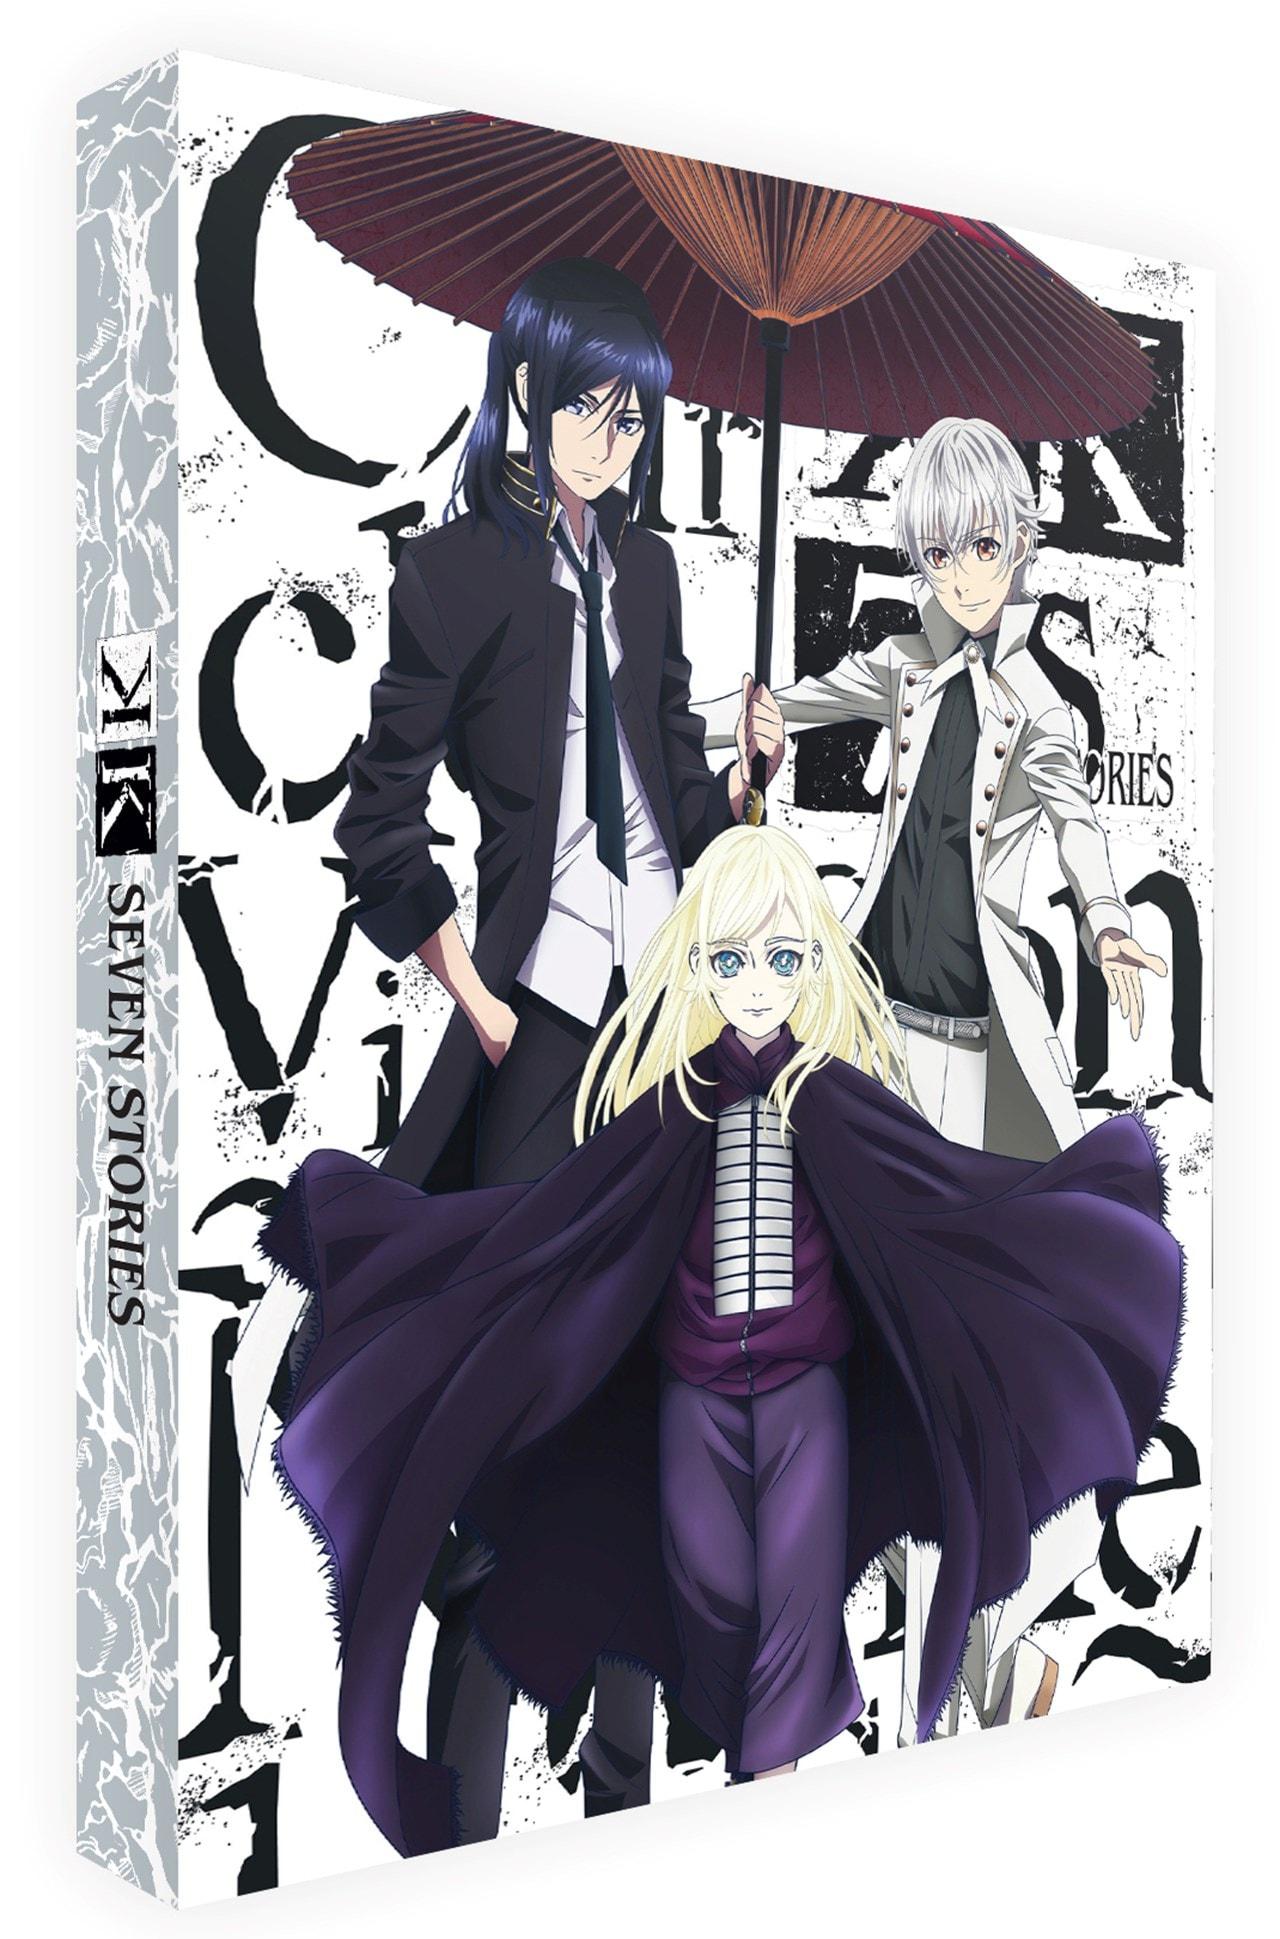 K - Seven Stories - 2